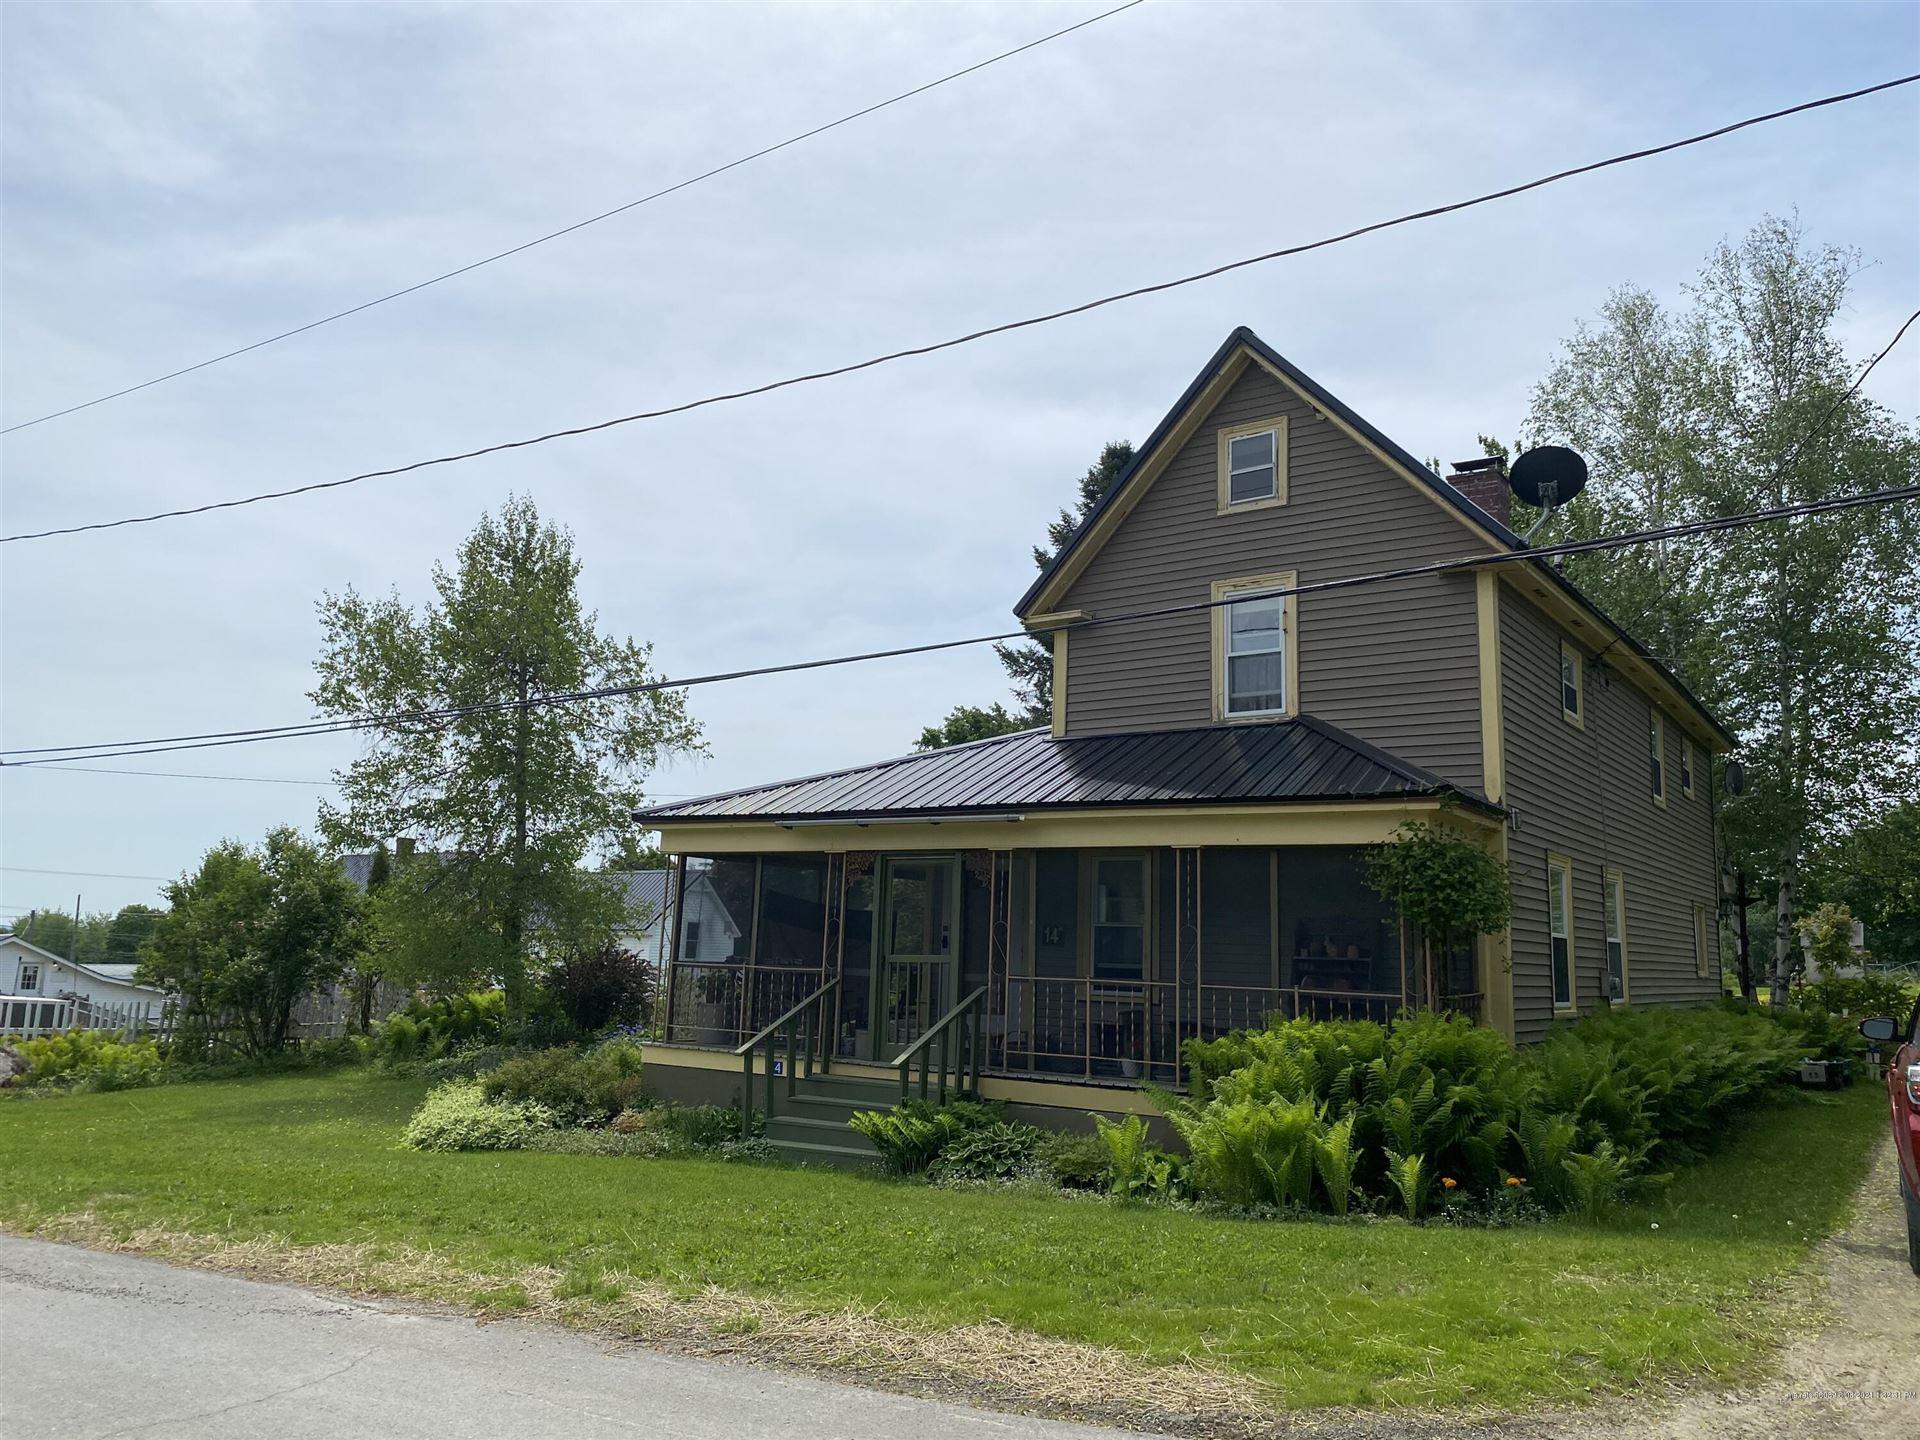 Photo of 14 Cherry Hill Street, Monticello, ME 04760 (MLS # 1495155)